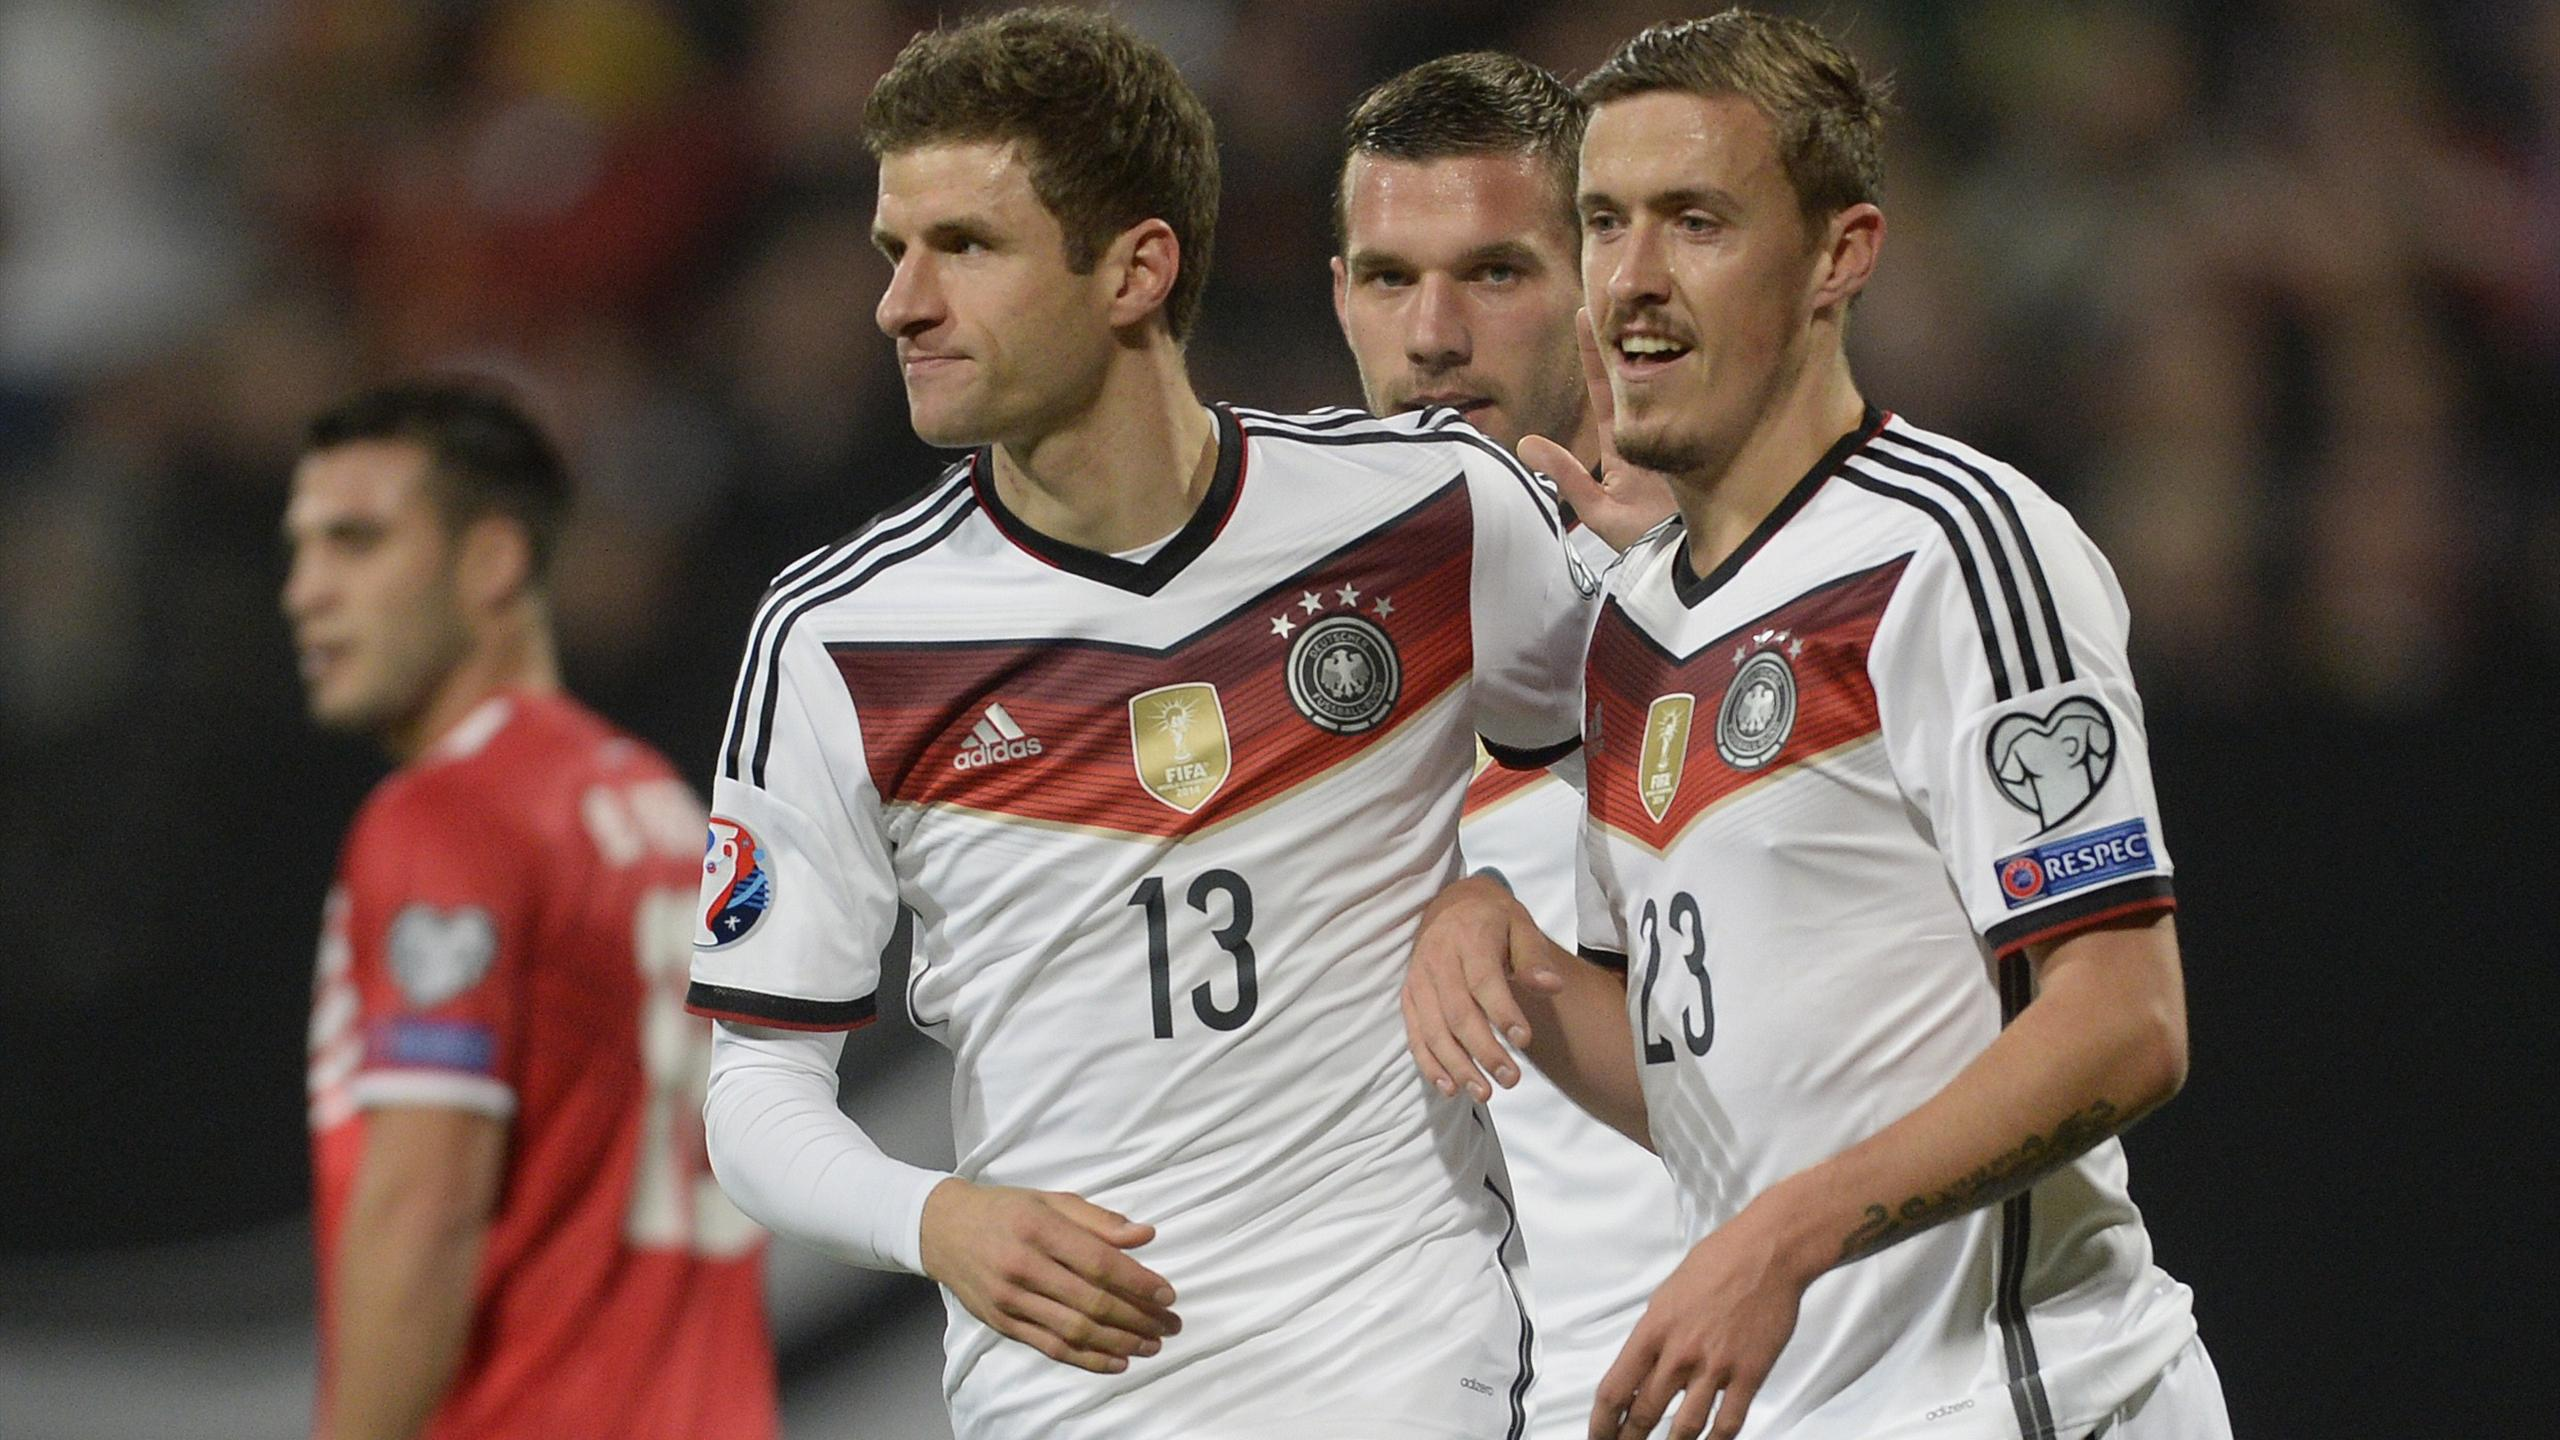 Thomas Müller, Lukas Podolski et Max Kruse face à Gibraltar